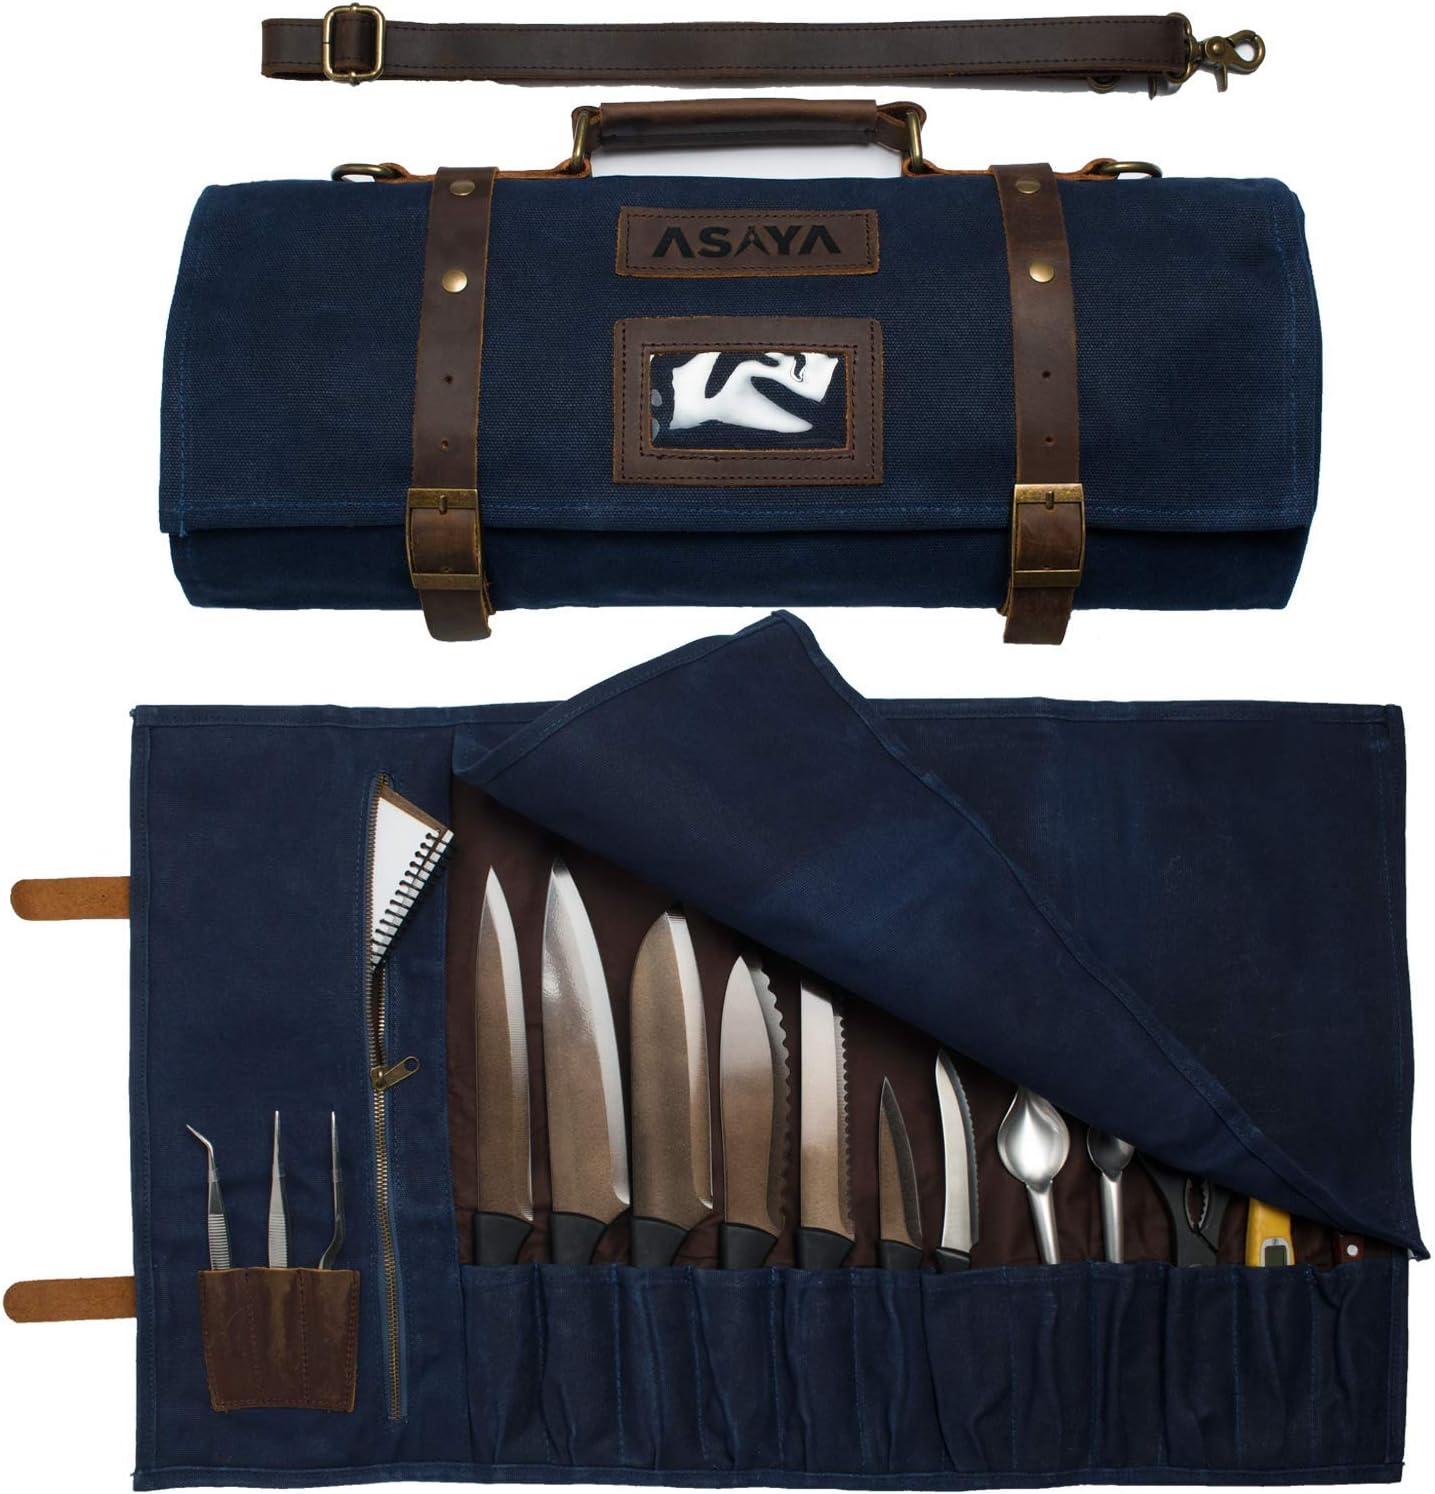 Asaya Waxed Canvas Knife High order Roll - Slots shopping Holder and 15 Card